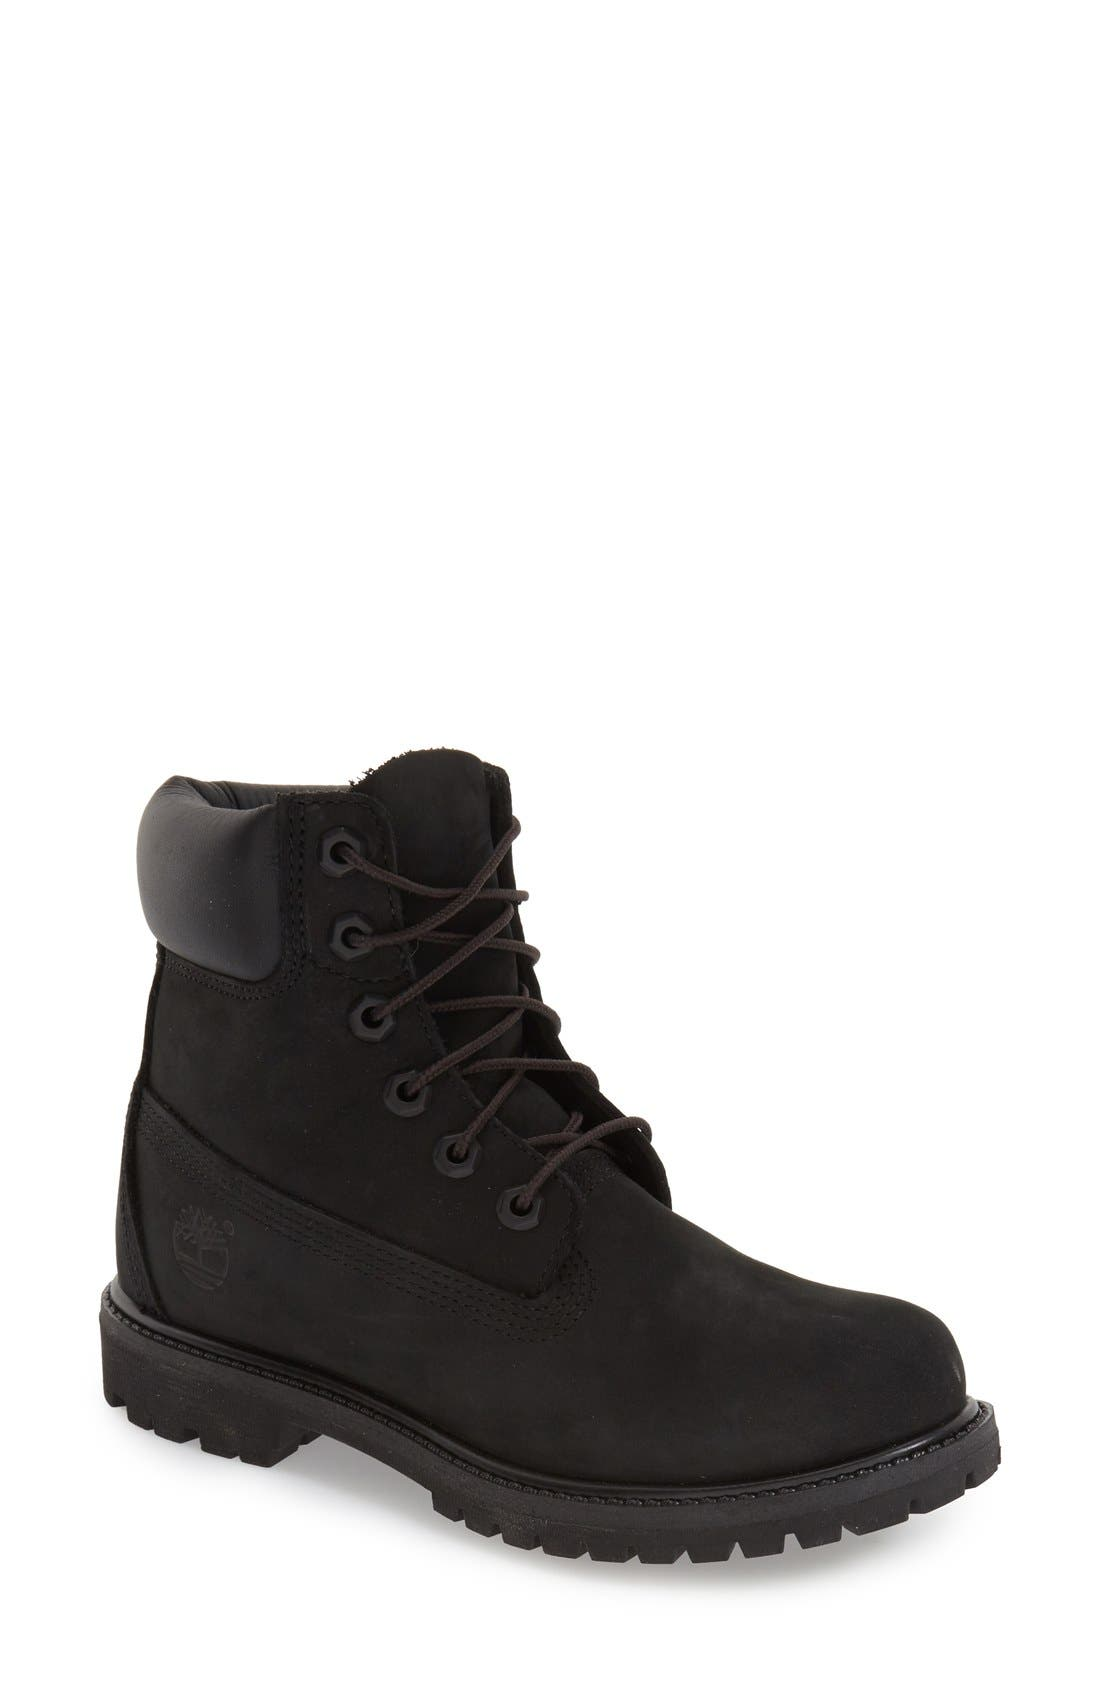 '6 Inch Premium' Waterproof Boot,                         Main,                         color, Black Nubuck Leather